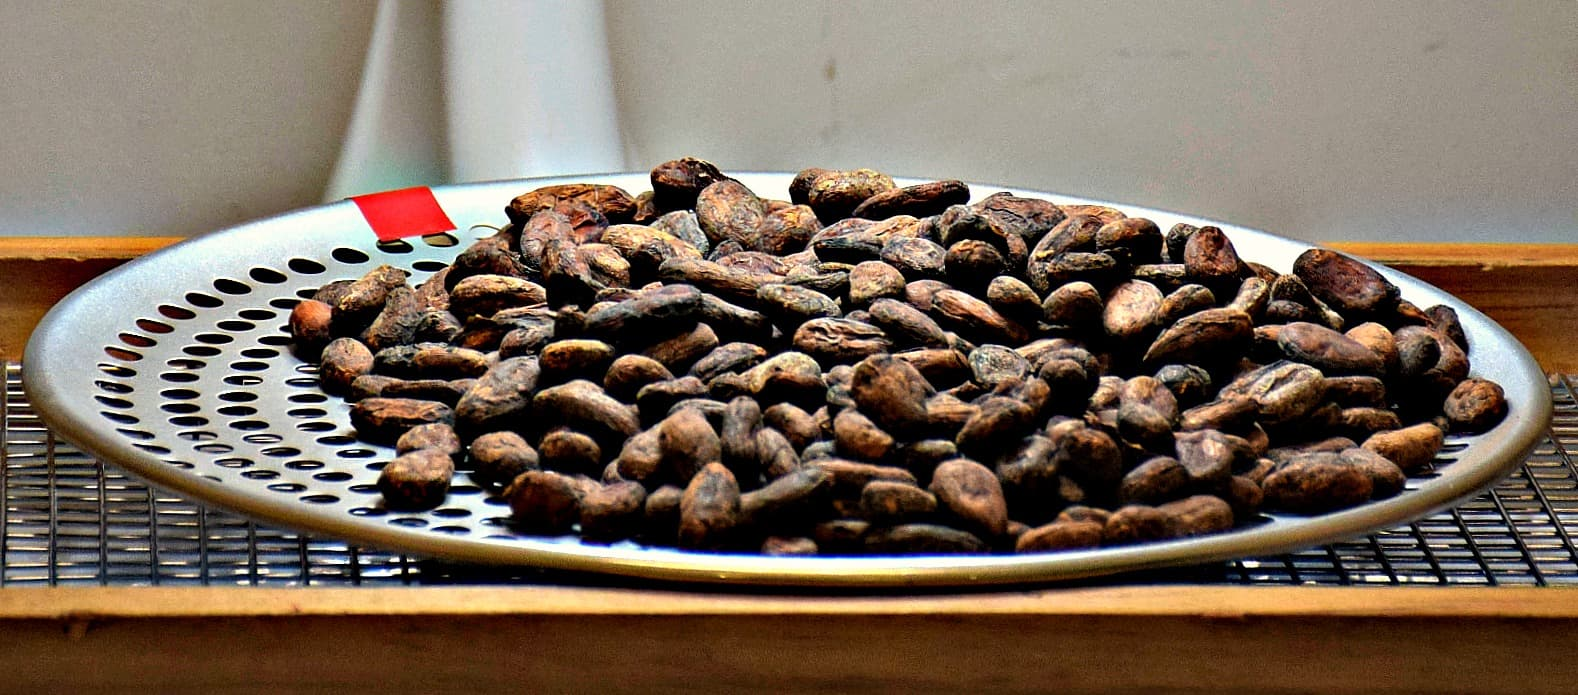 Cocoa Bean sorting